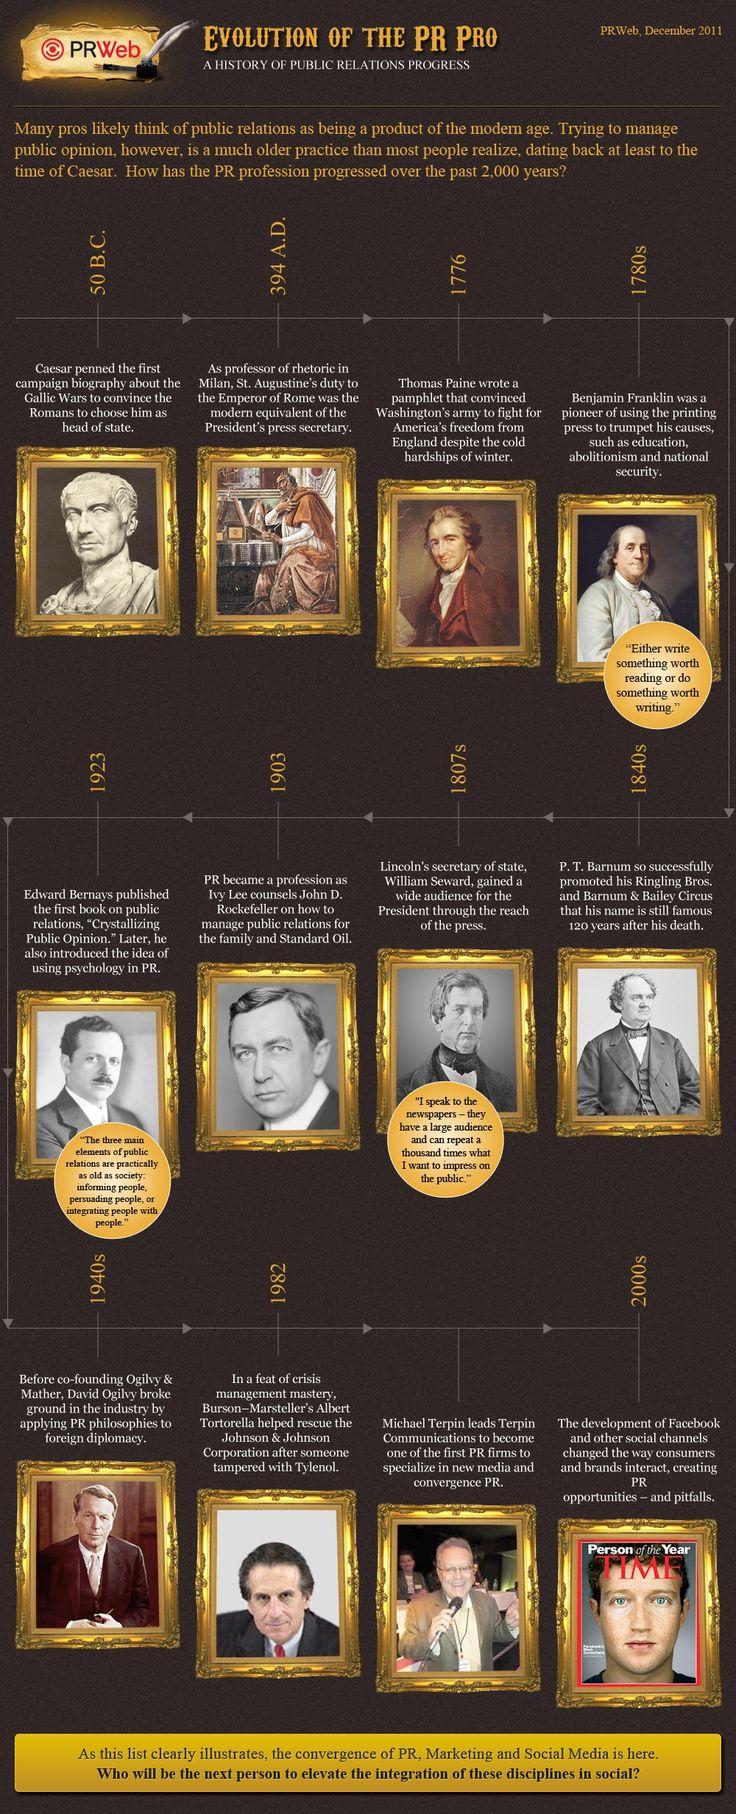 Infografía Historia de las Relaciones Públicas. Fuente original: http://www.bloggingprweb.com/evolution-of-a-pr-pro-infographic, aportada por @felipedjmg